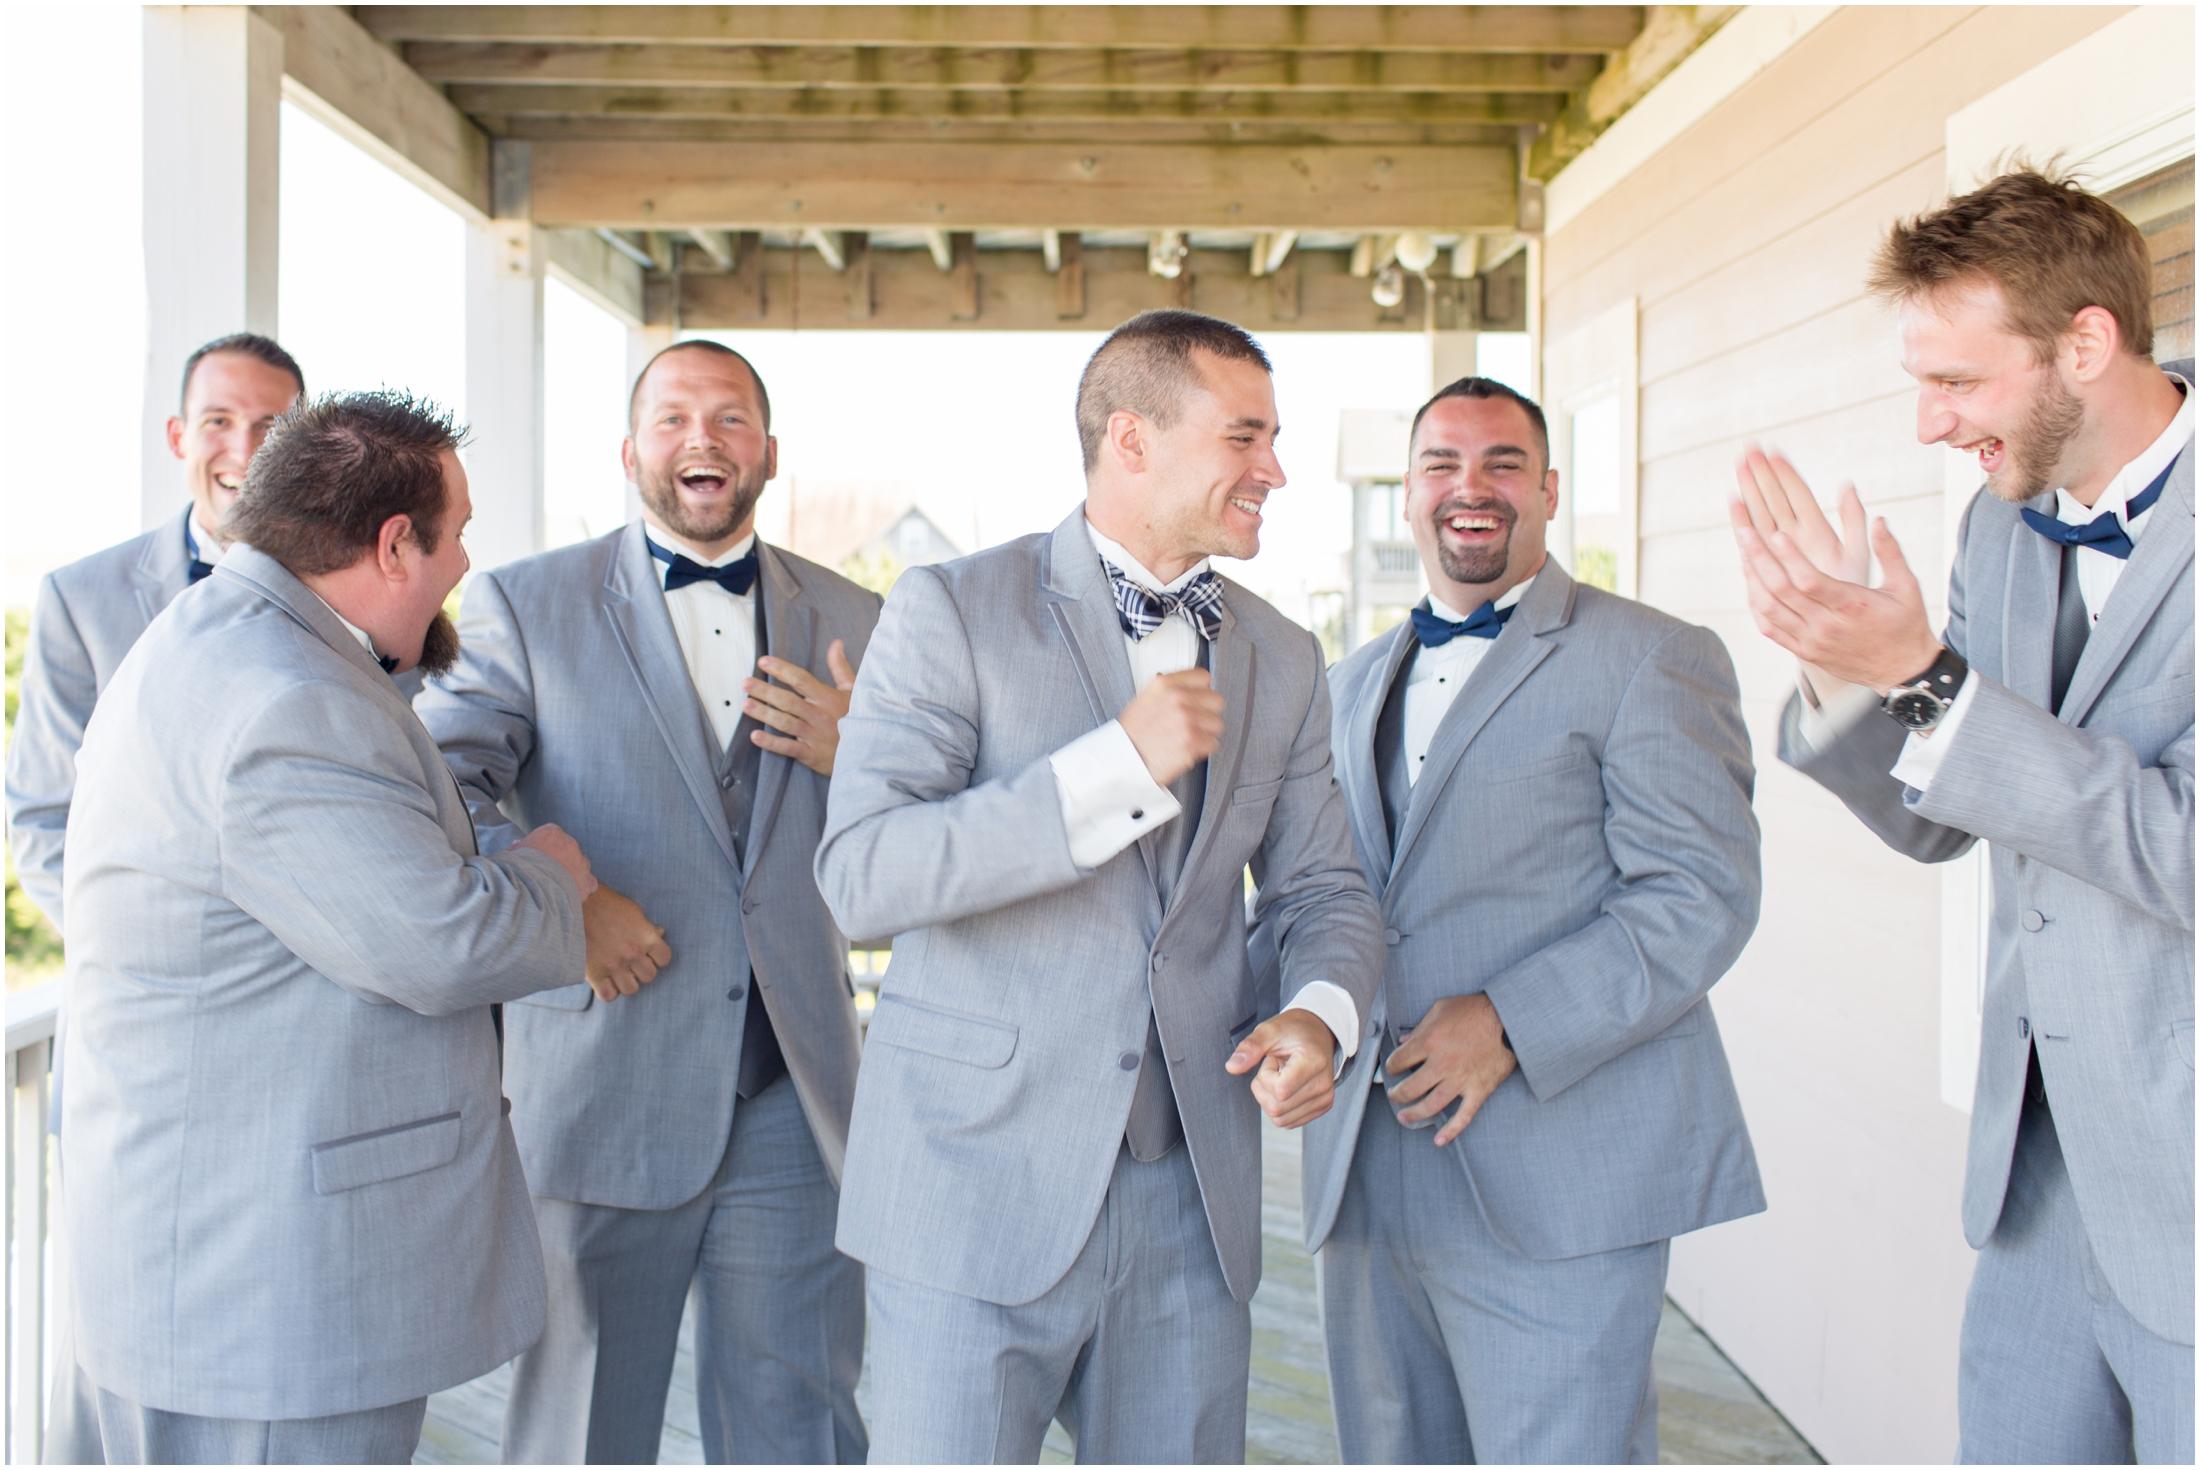 Pearce-Wedding-Bridal-Party-340.jpg